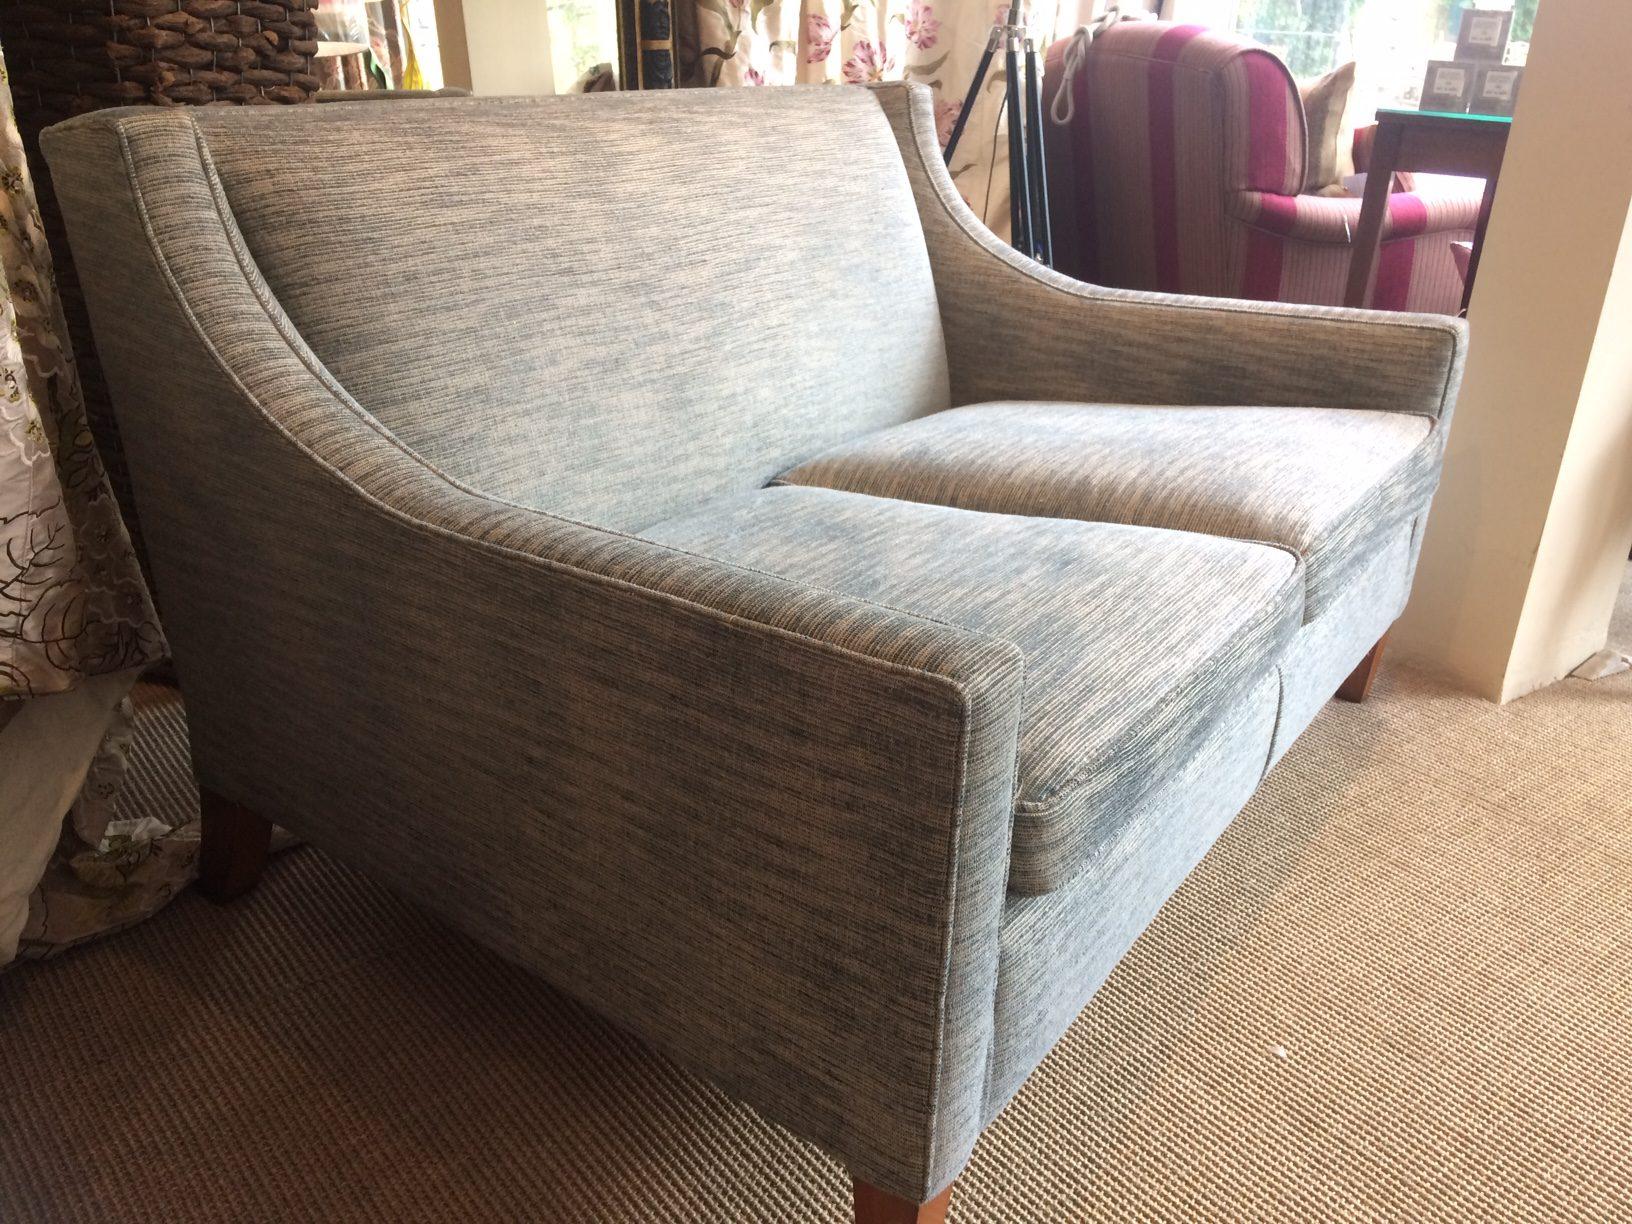 Josephine Sofa Chairs Pertaining To Latest Zoffany Josephine Sofa – Felbrigg Design (View 16 of 20)